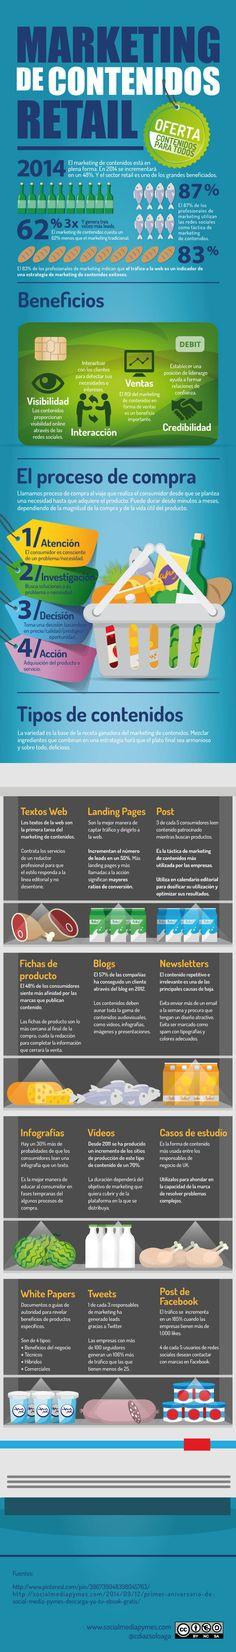 Marketing de contenido para retail. Infografía en español. #CommunityManager